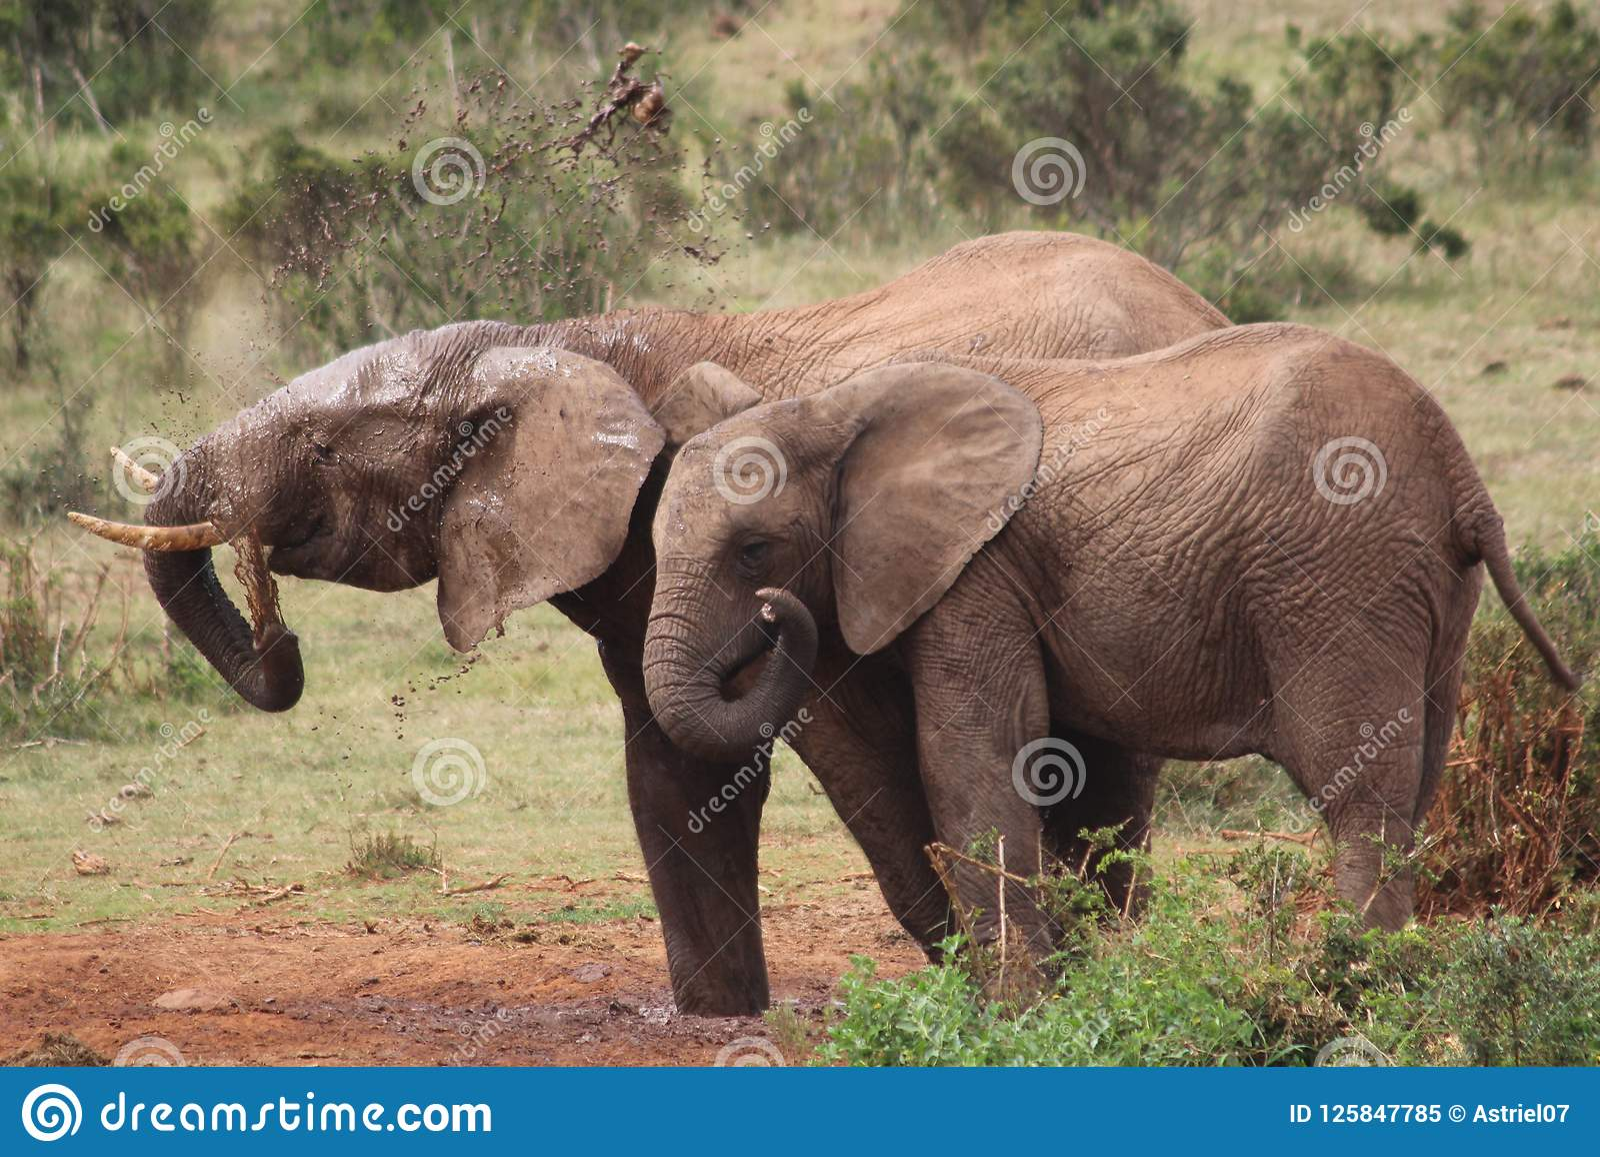 Elephants throwing dirt on backs